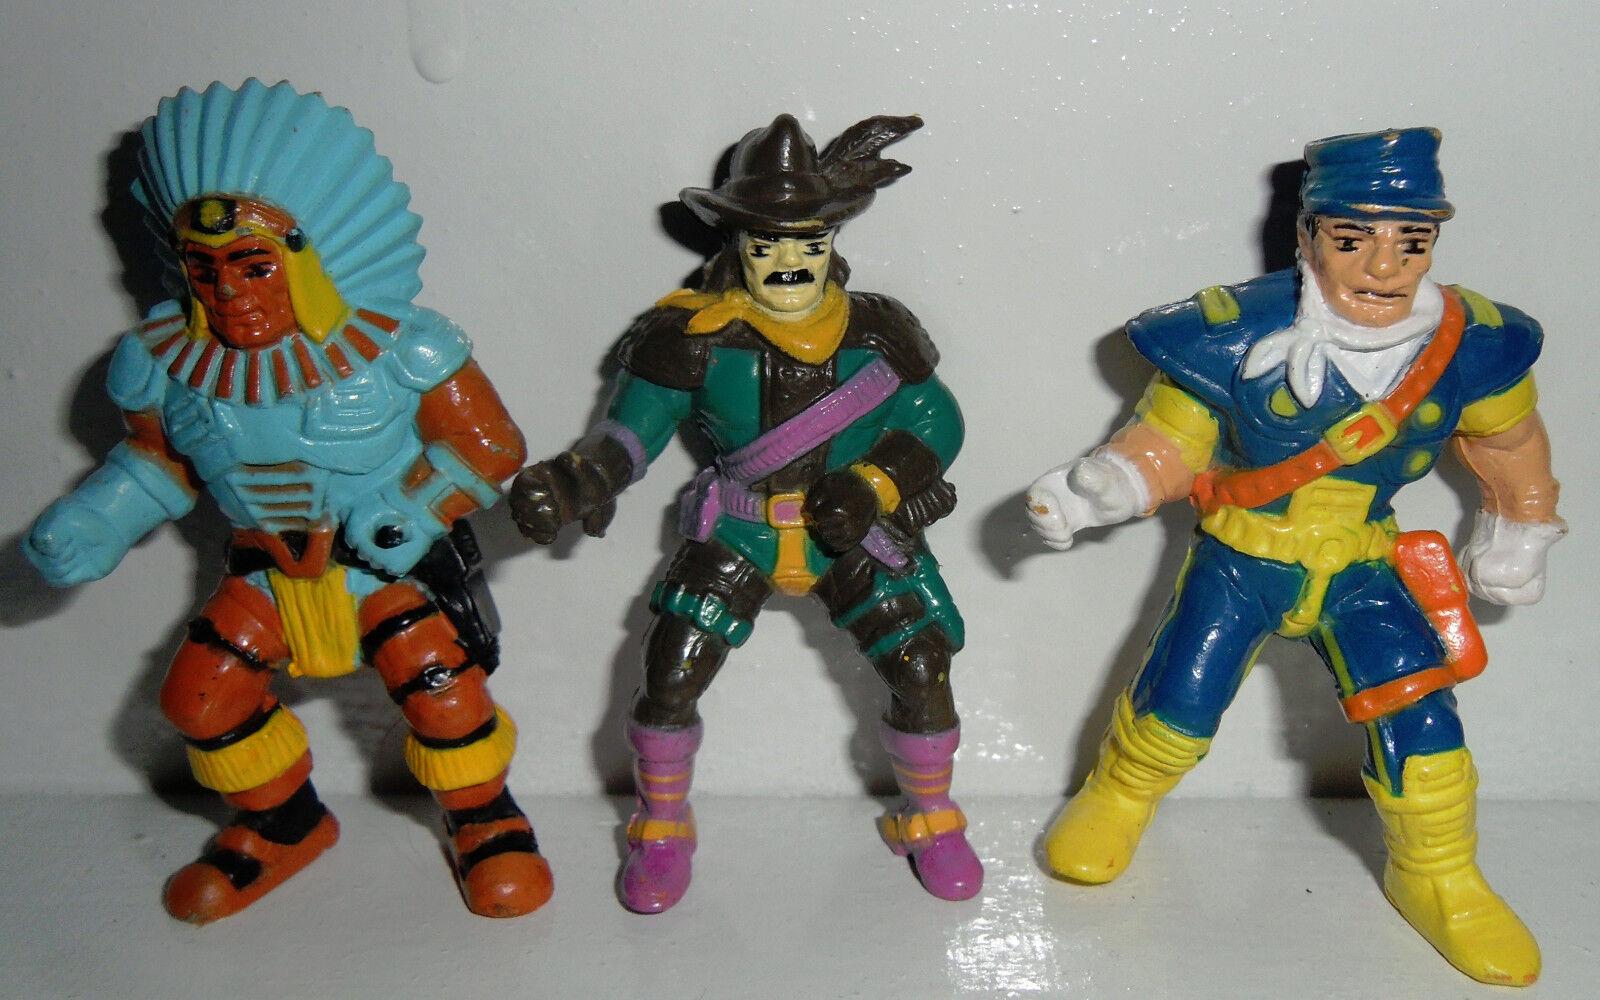 Vintage 1986 X-CHANGERS COSMIC COWBOY Action Figure MINIATURES LOT Bootleg MOTU